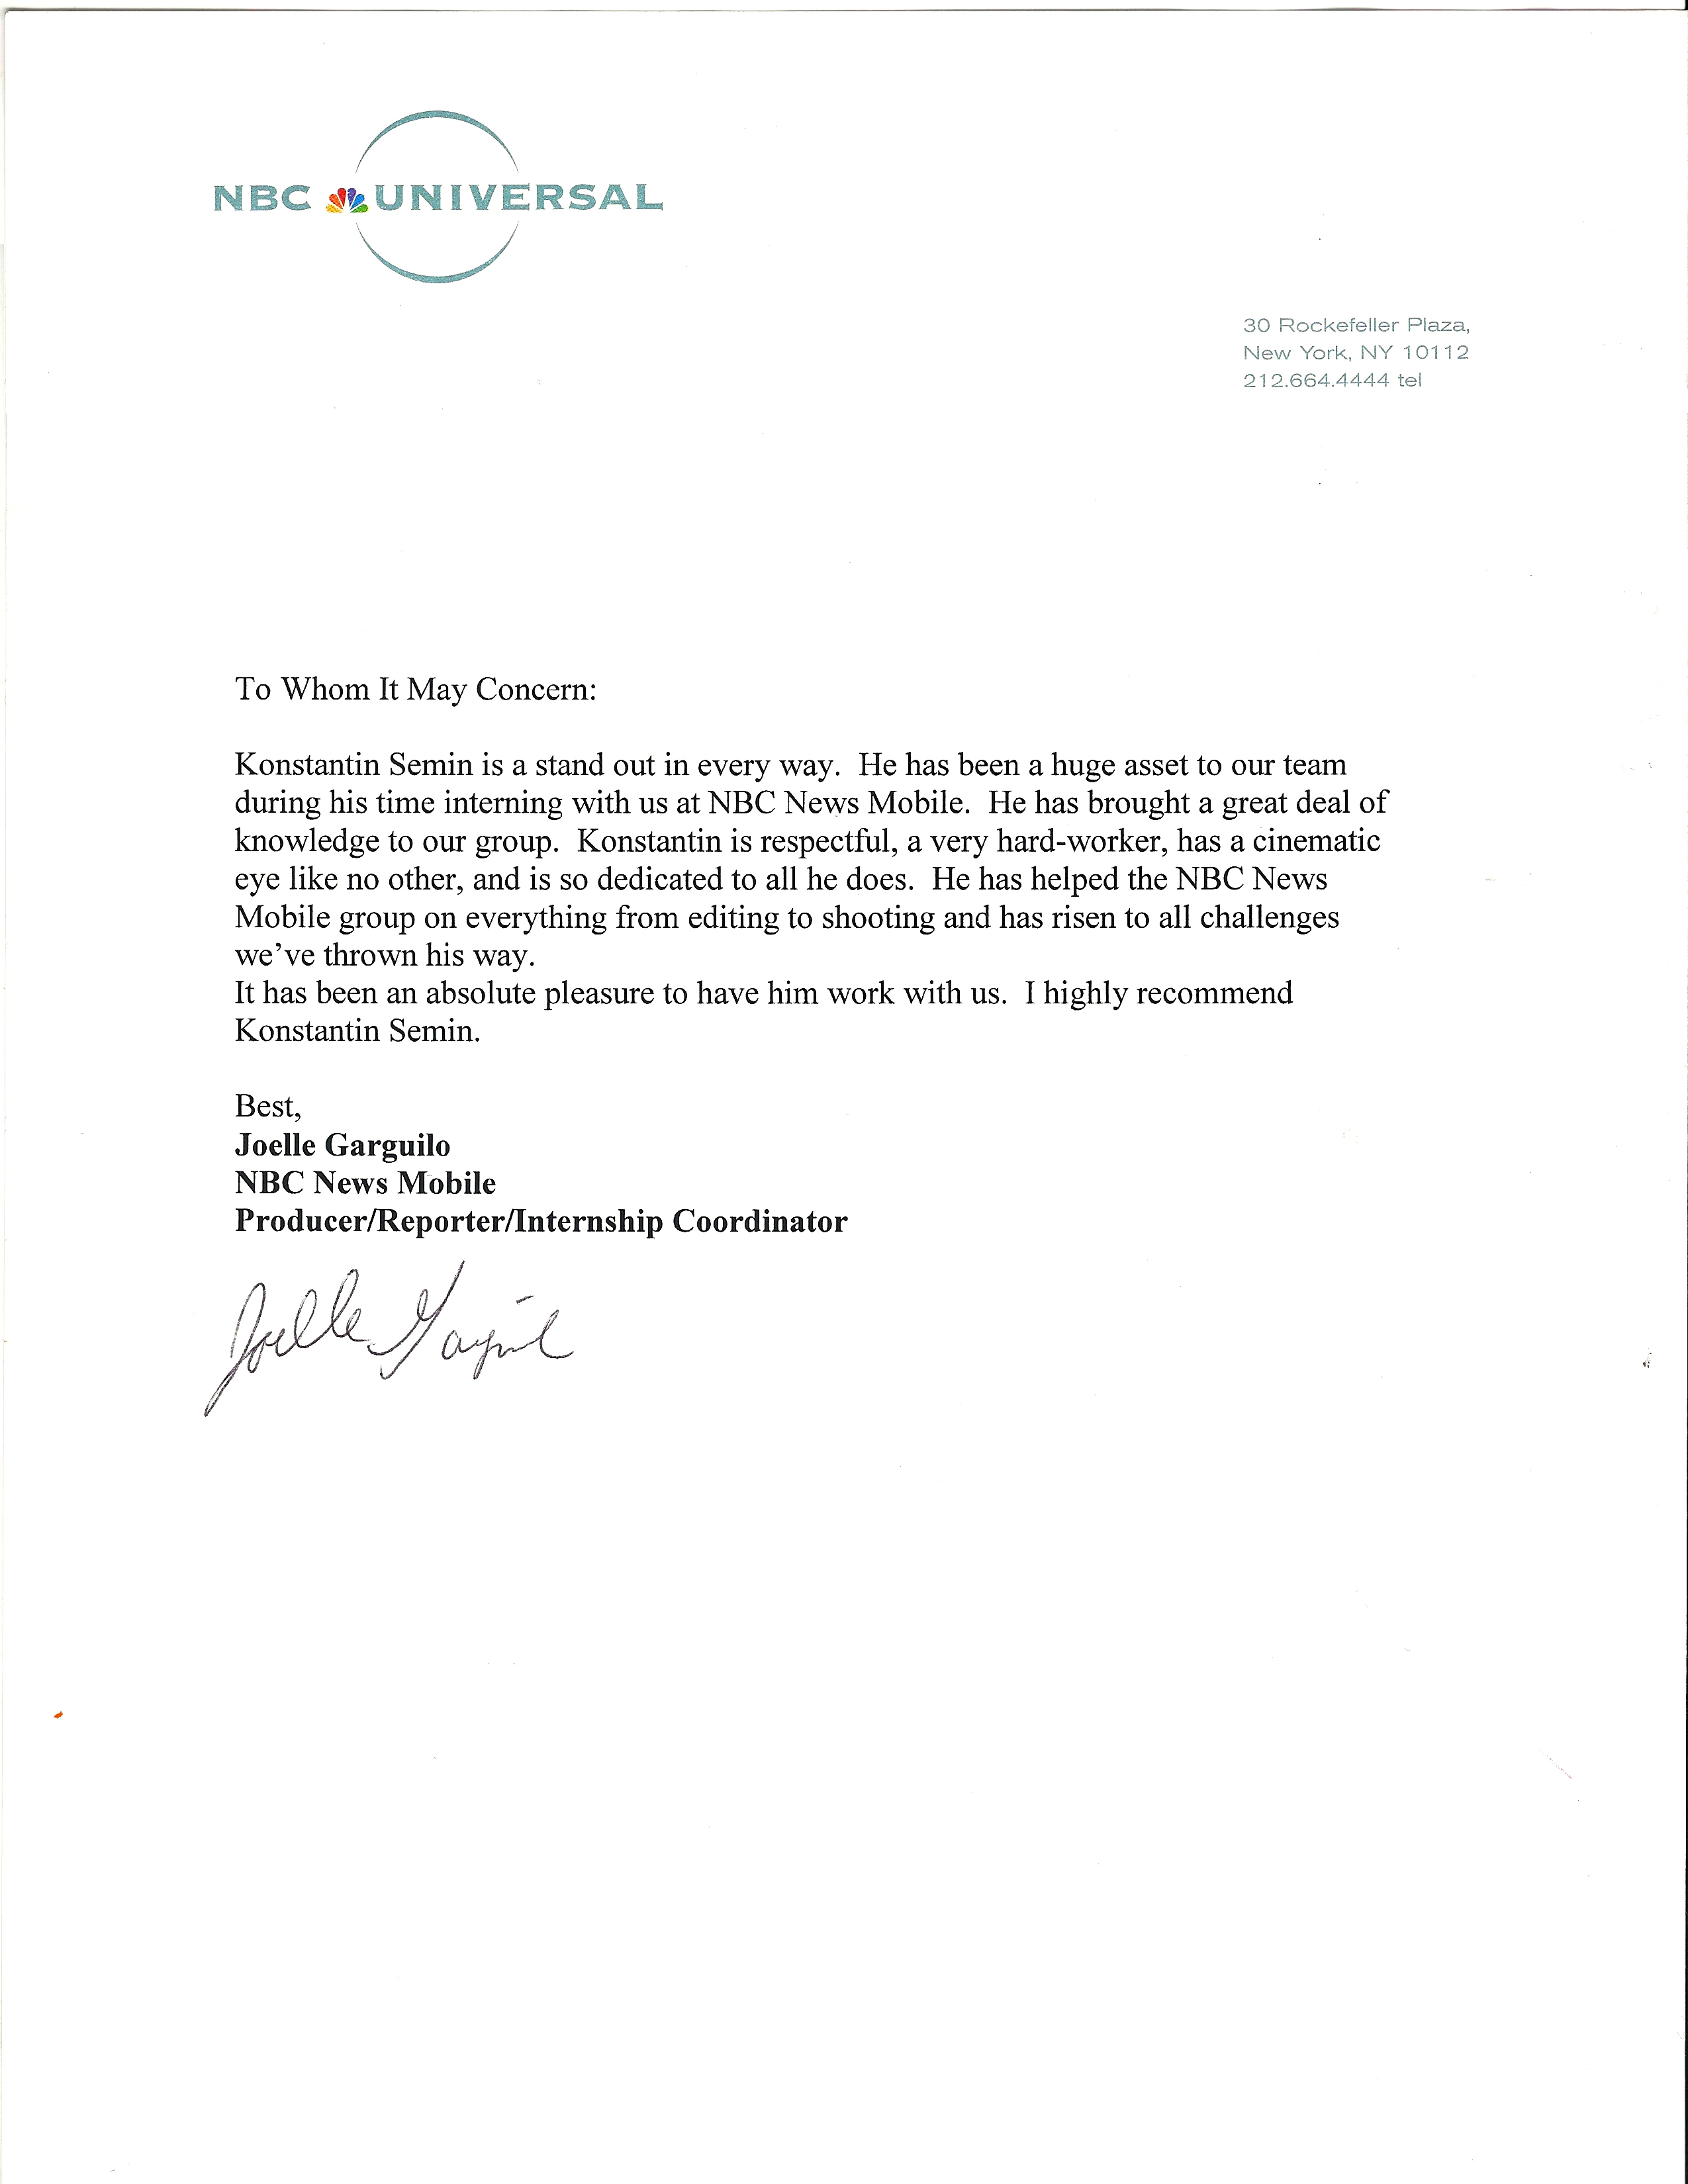 It Recommendation Letter | Letter Format 2017